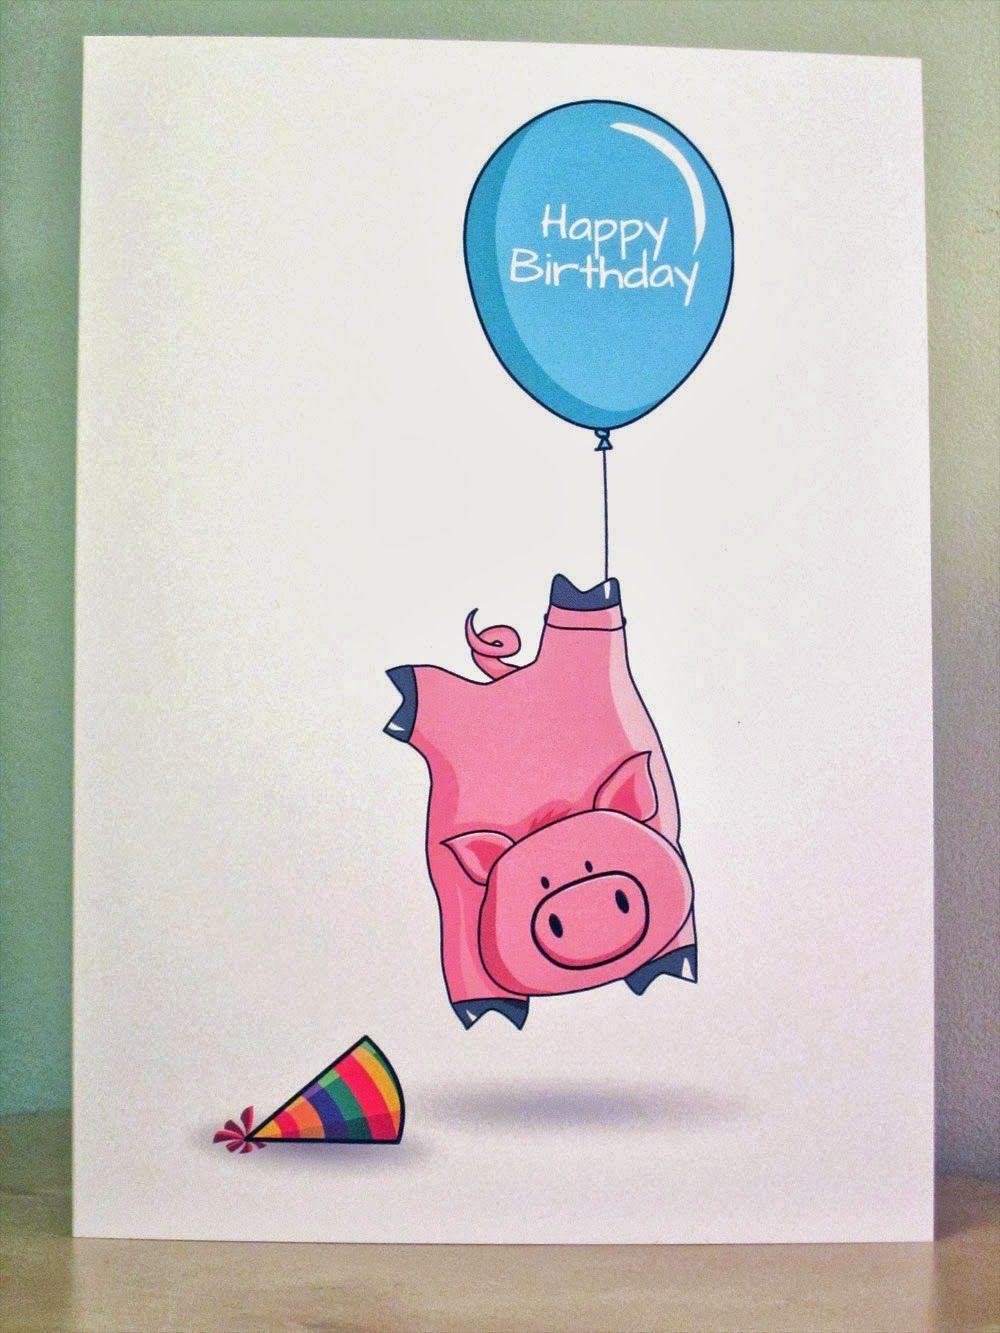 Pig Birthday Card Http Www Etsy Com Listing 163527307 Pig Birthday Card Cat Birthday Card Cool Birthday Cards Happy Birthday Pig